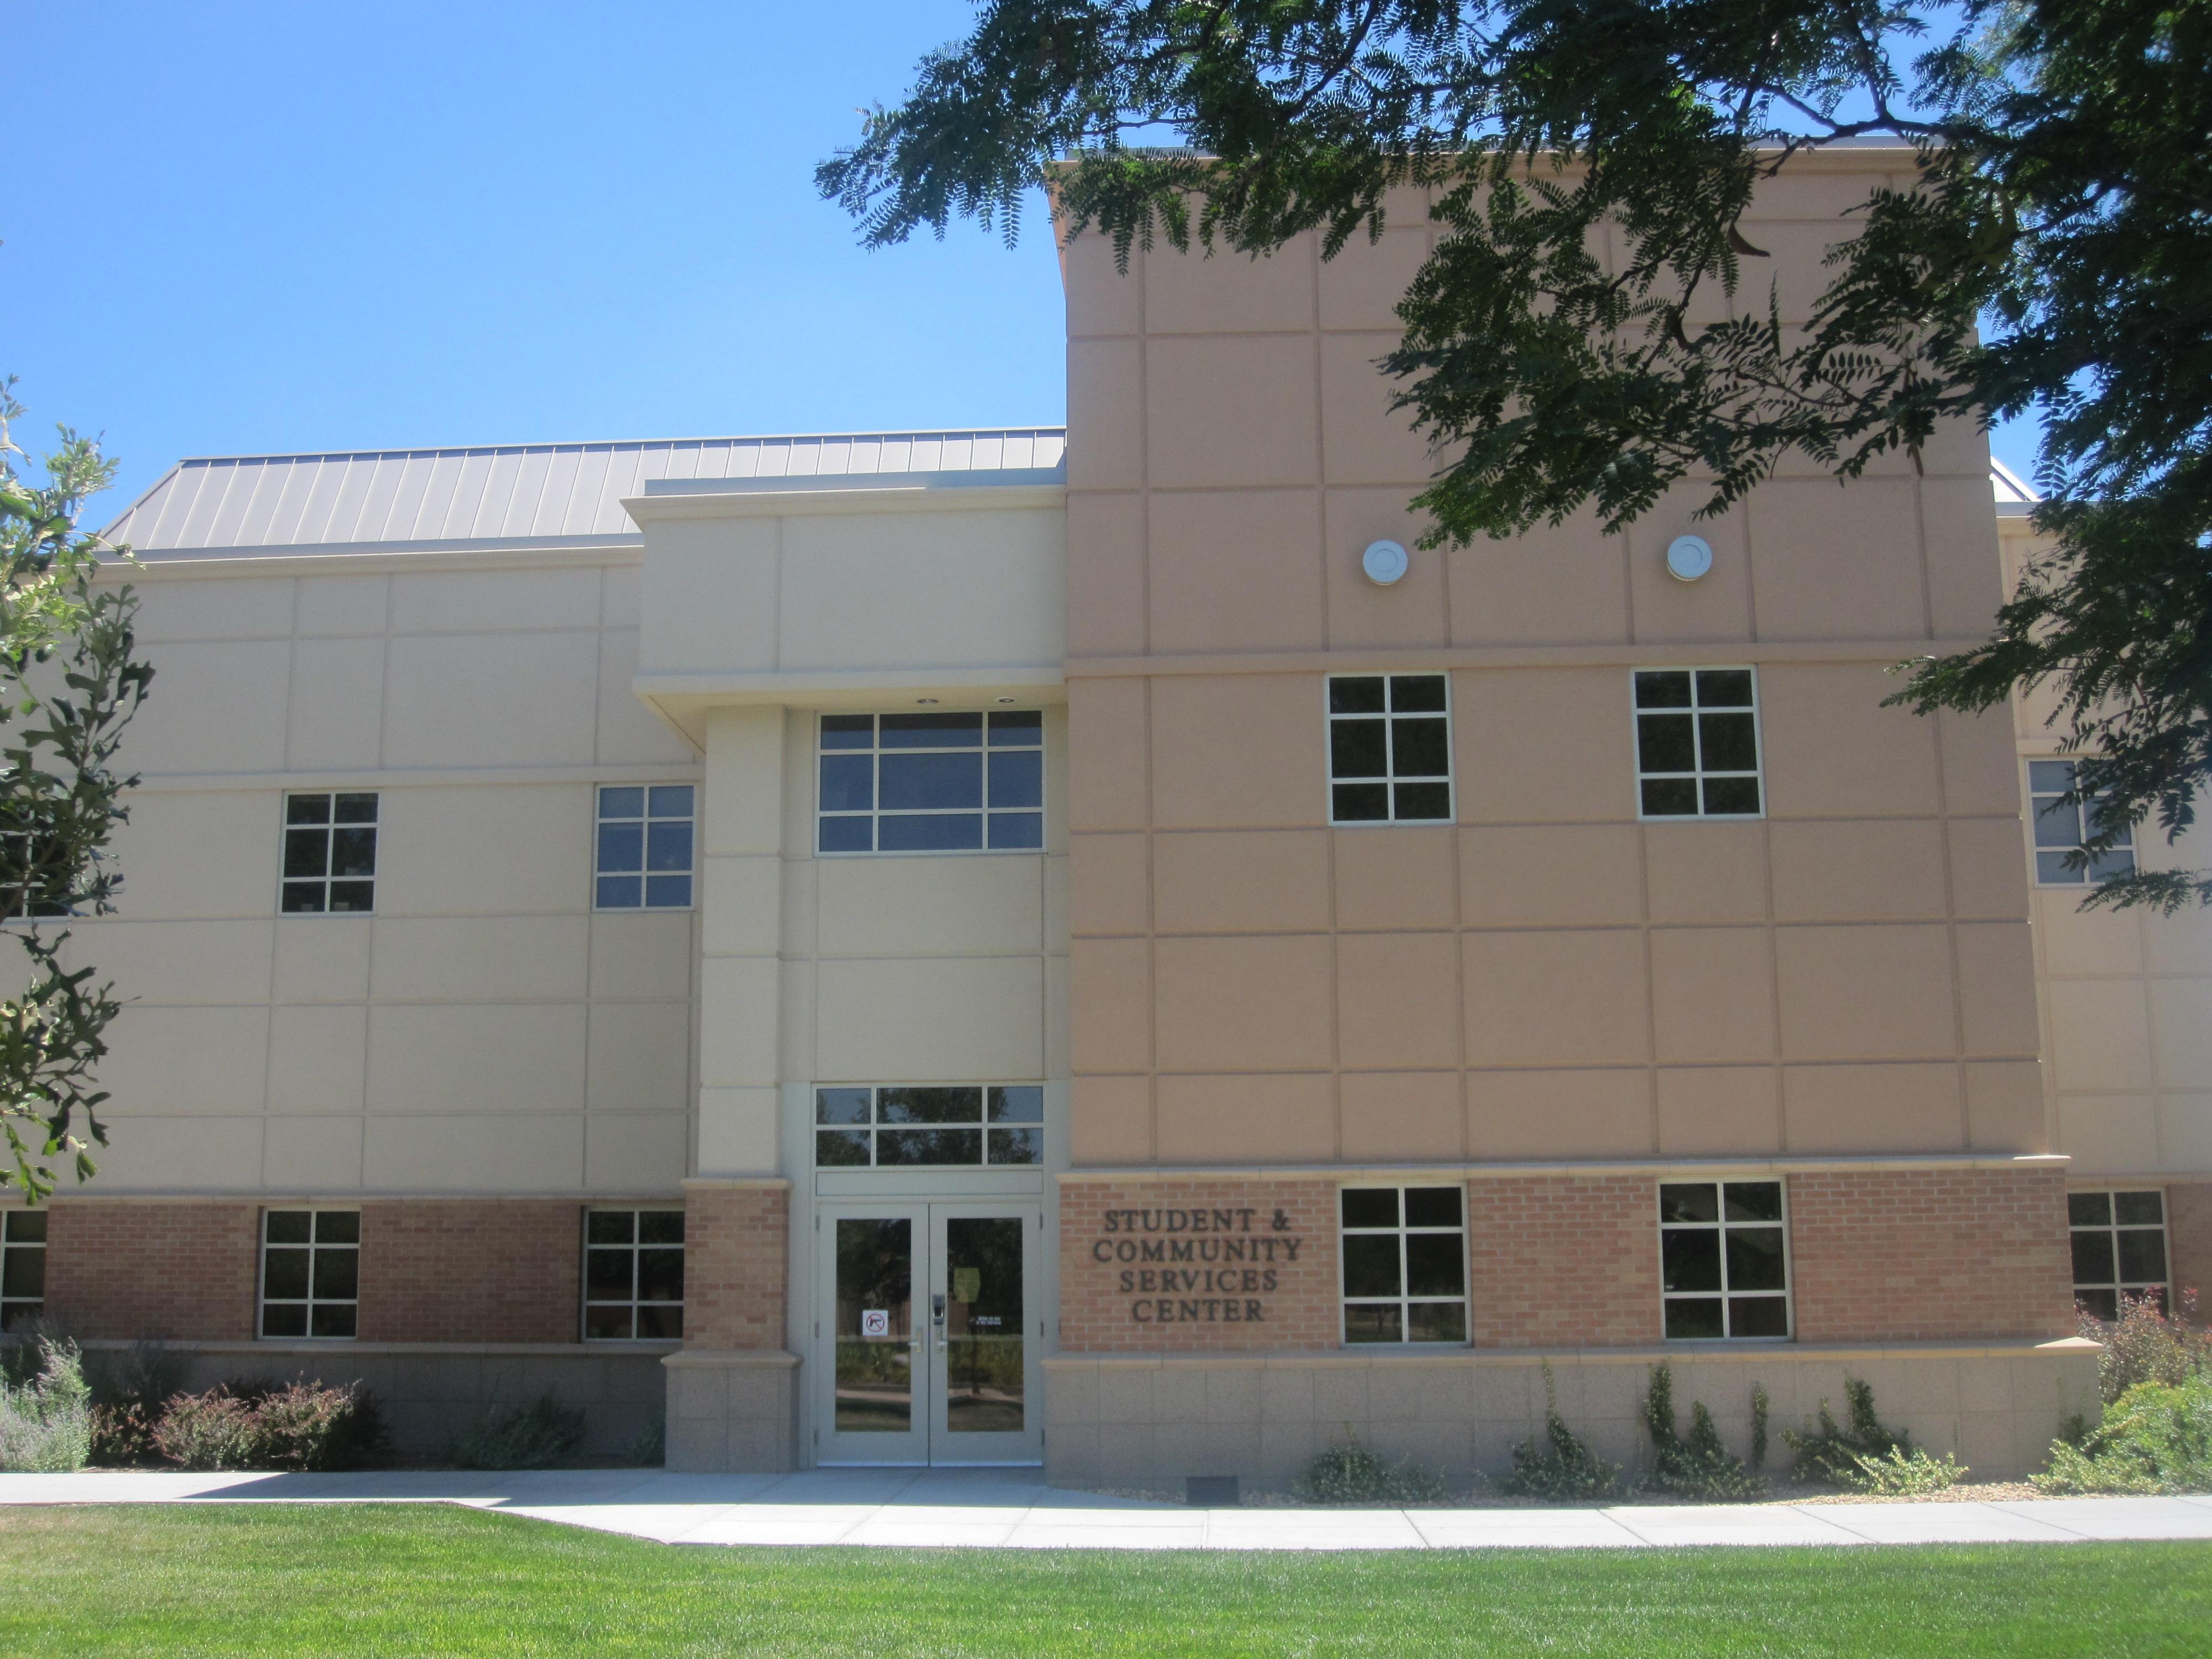 Jim Kelly Jones County Junior College